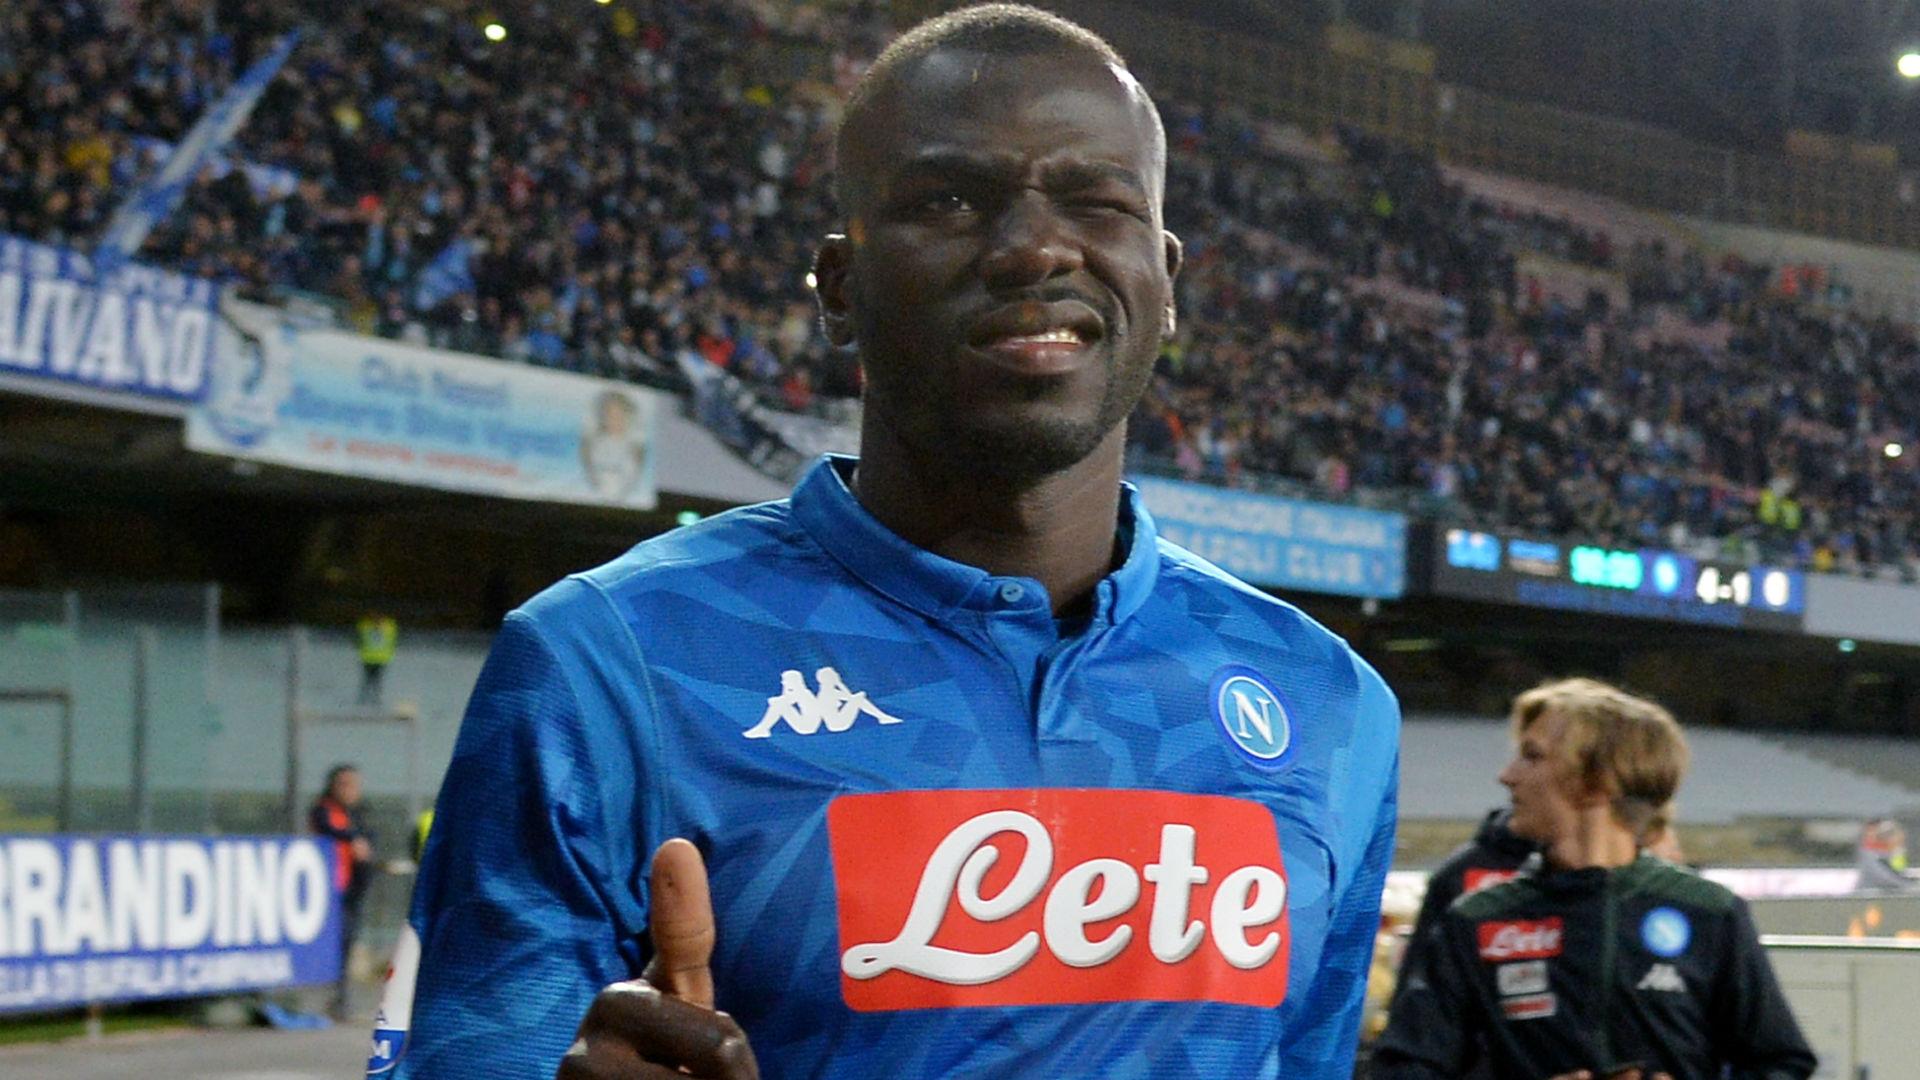 Ballon d'Or - Kalidou Koulibaly fier d'être dans la liste